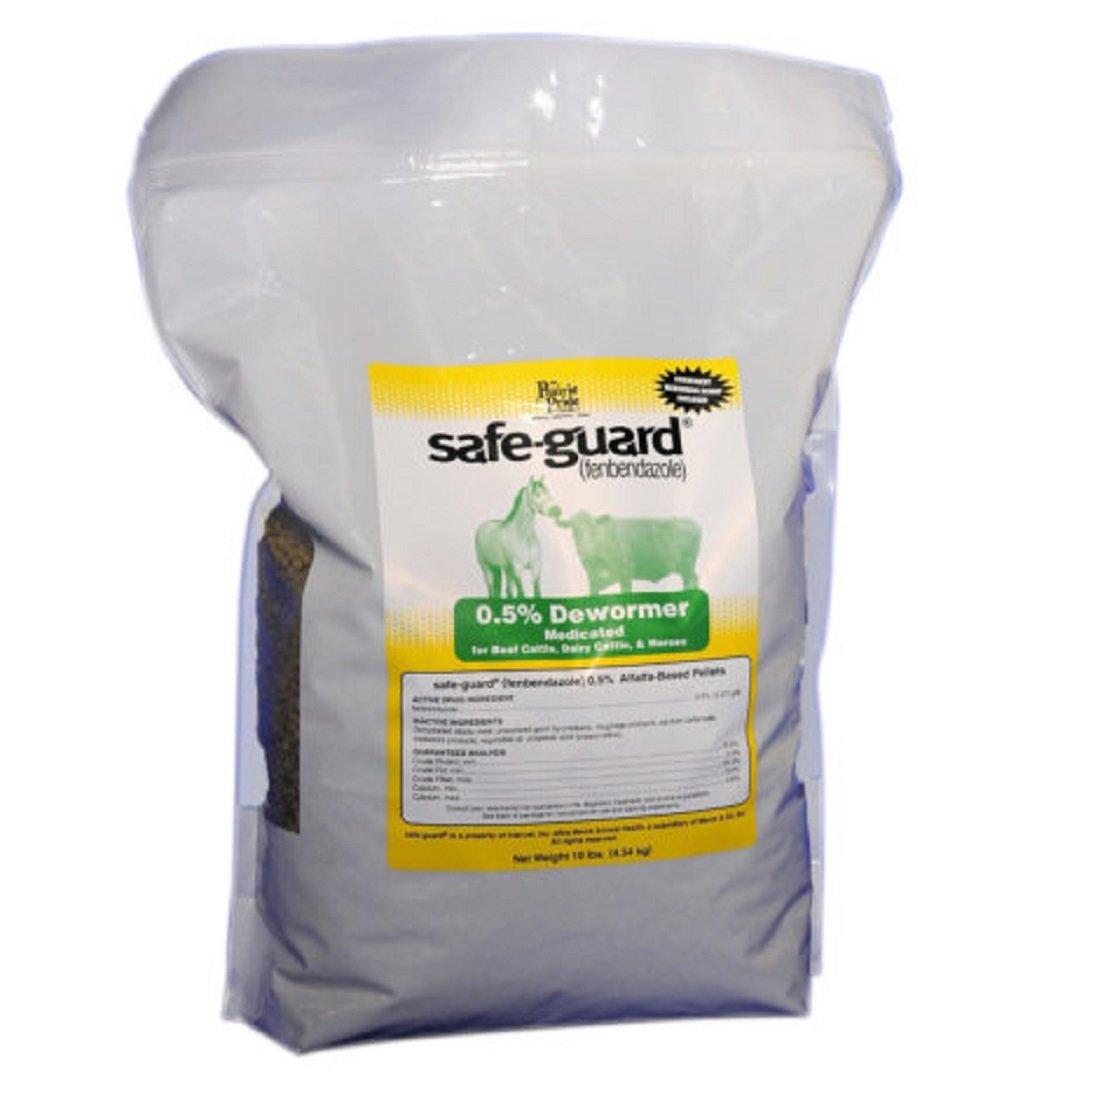 PRAIRIE PRIDE Medicated Dewormer for Farm Livestock - Pelleted alfalfa-based, contains 0.5% safe-guard - 10 LB